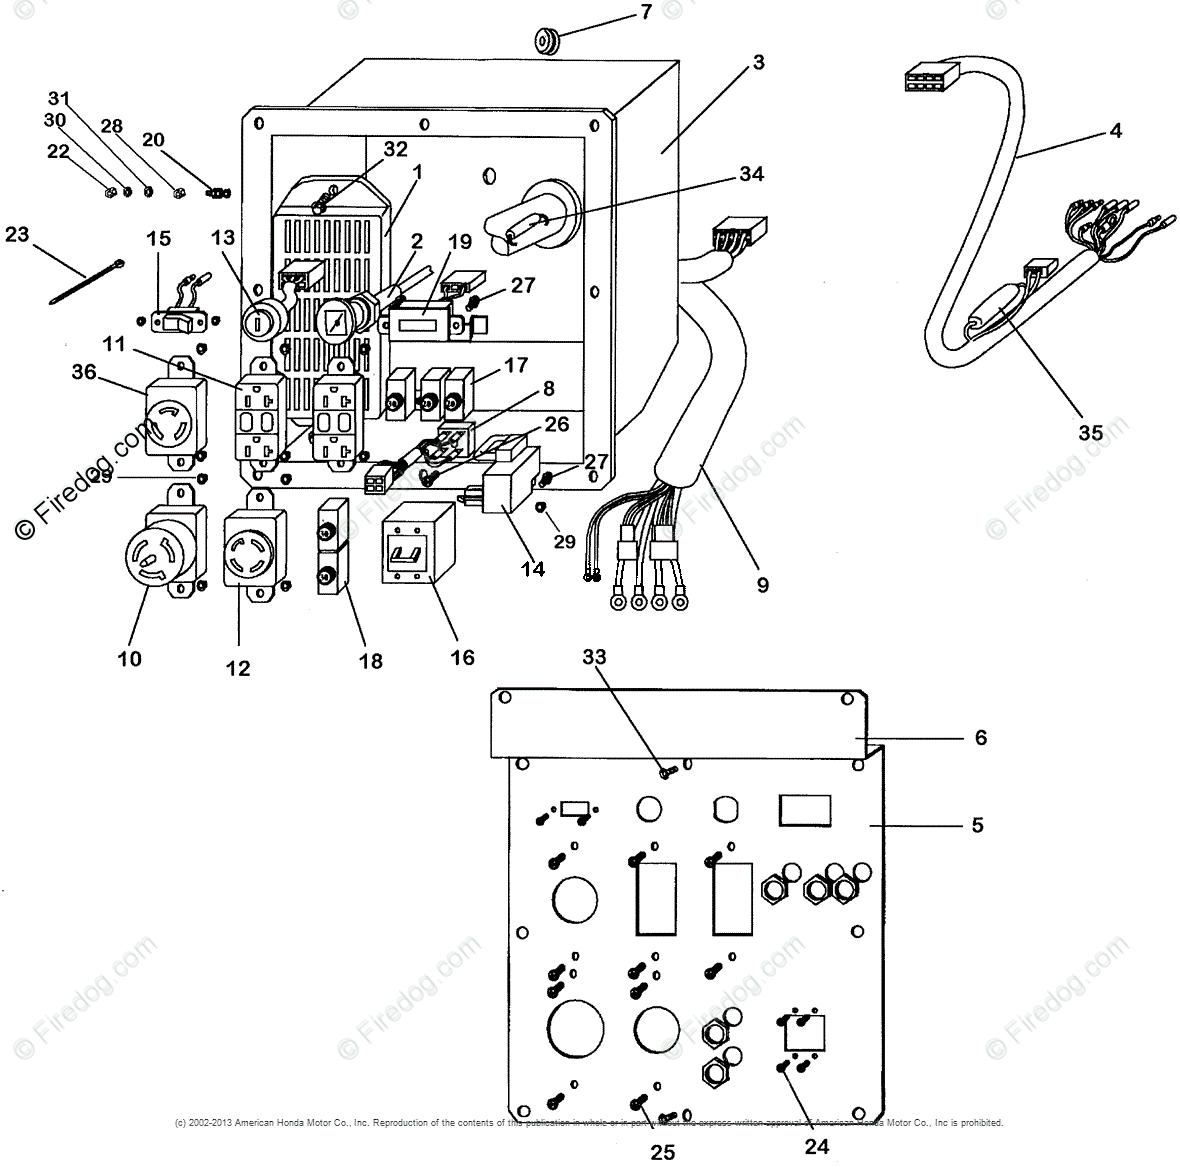 hight resolution of honda eb11000 generator wiring diagram wiring diagrams lol honda eb11000 generator wiring diagram